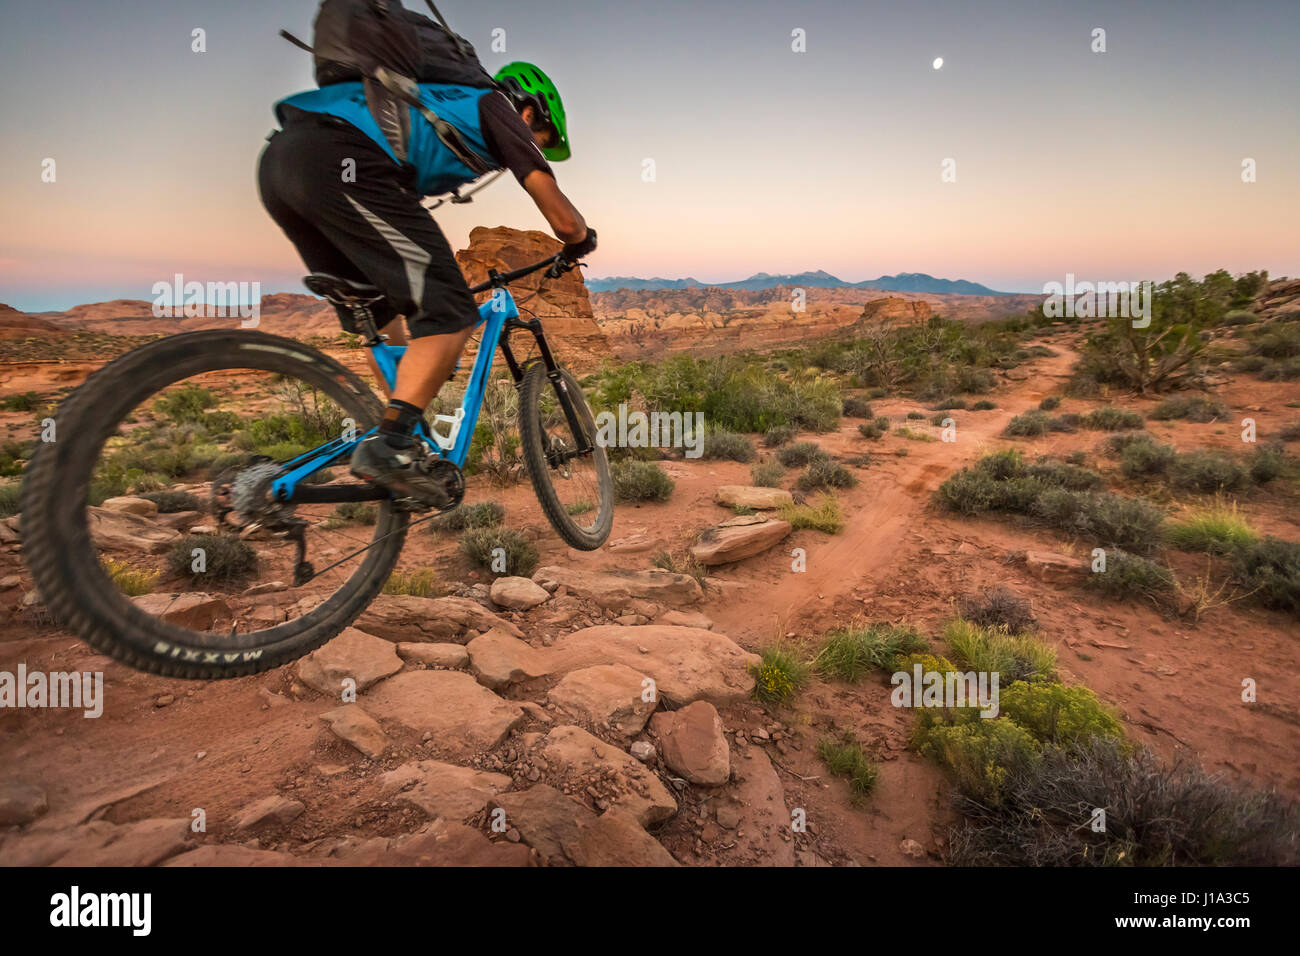 Tyson Swasey montaña en bicicleta por el sendero Hymasa, Moab, Utah. Imagen De Stock